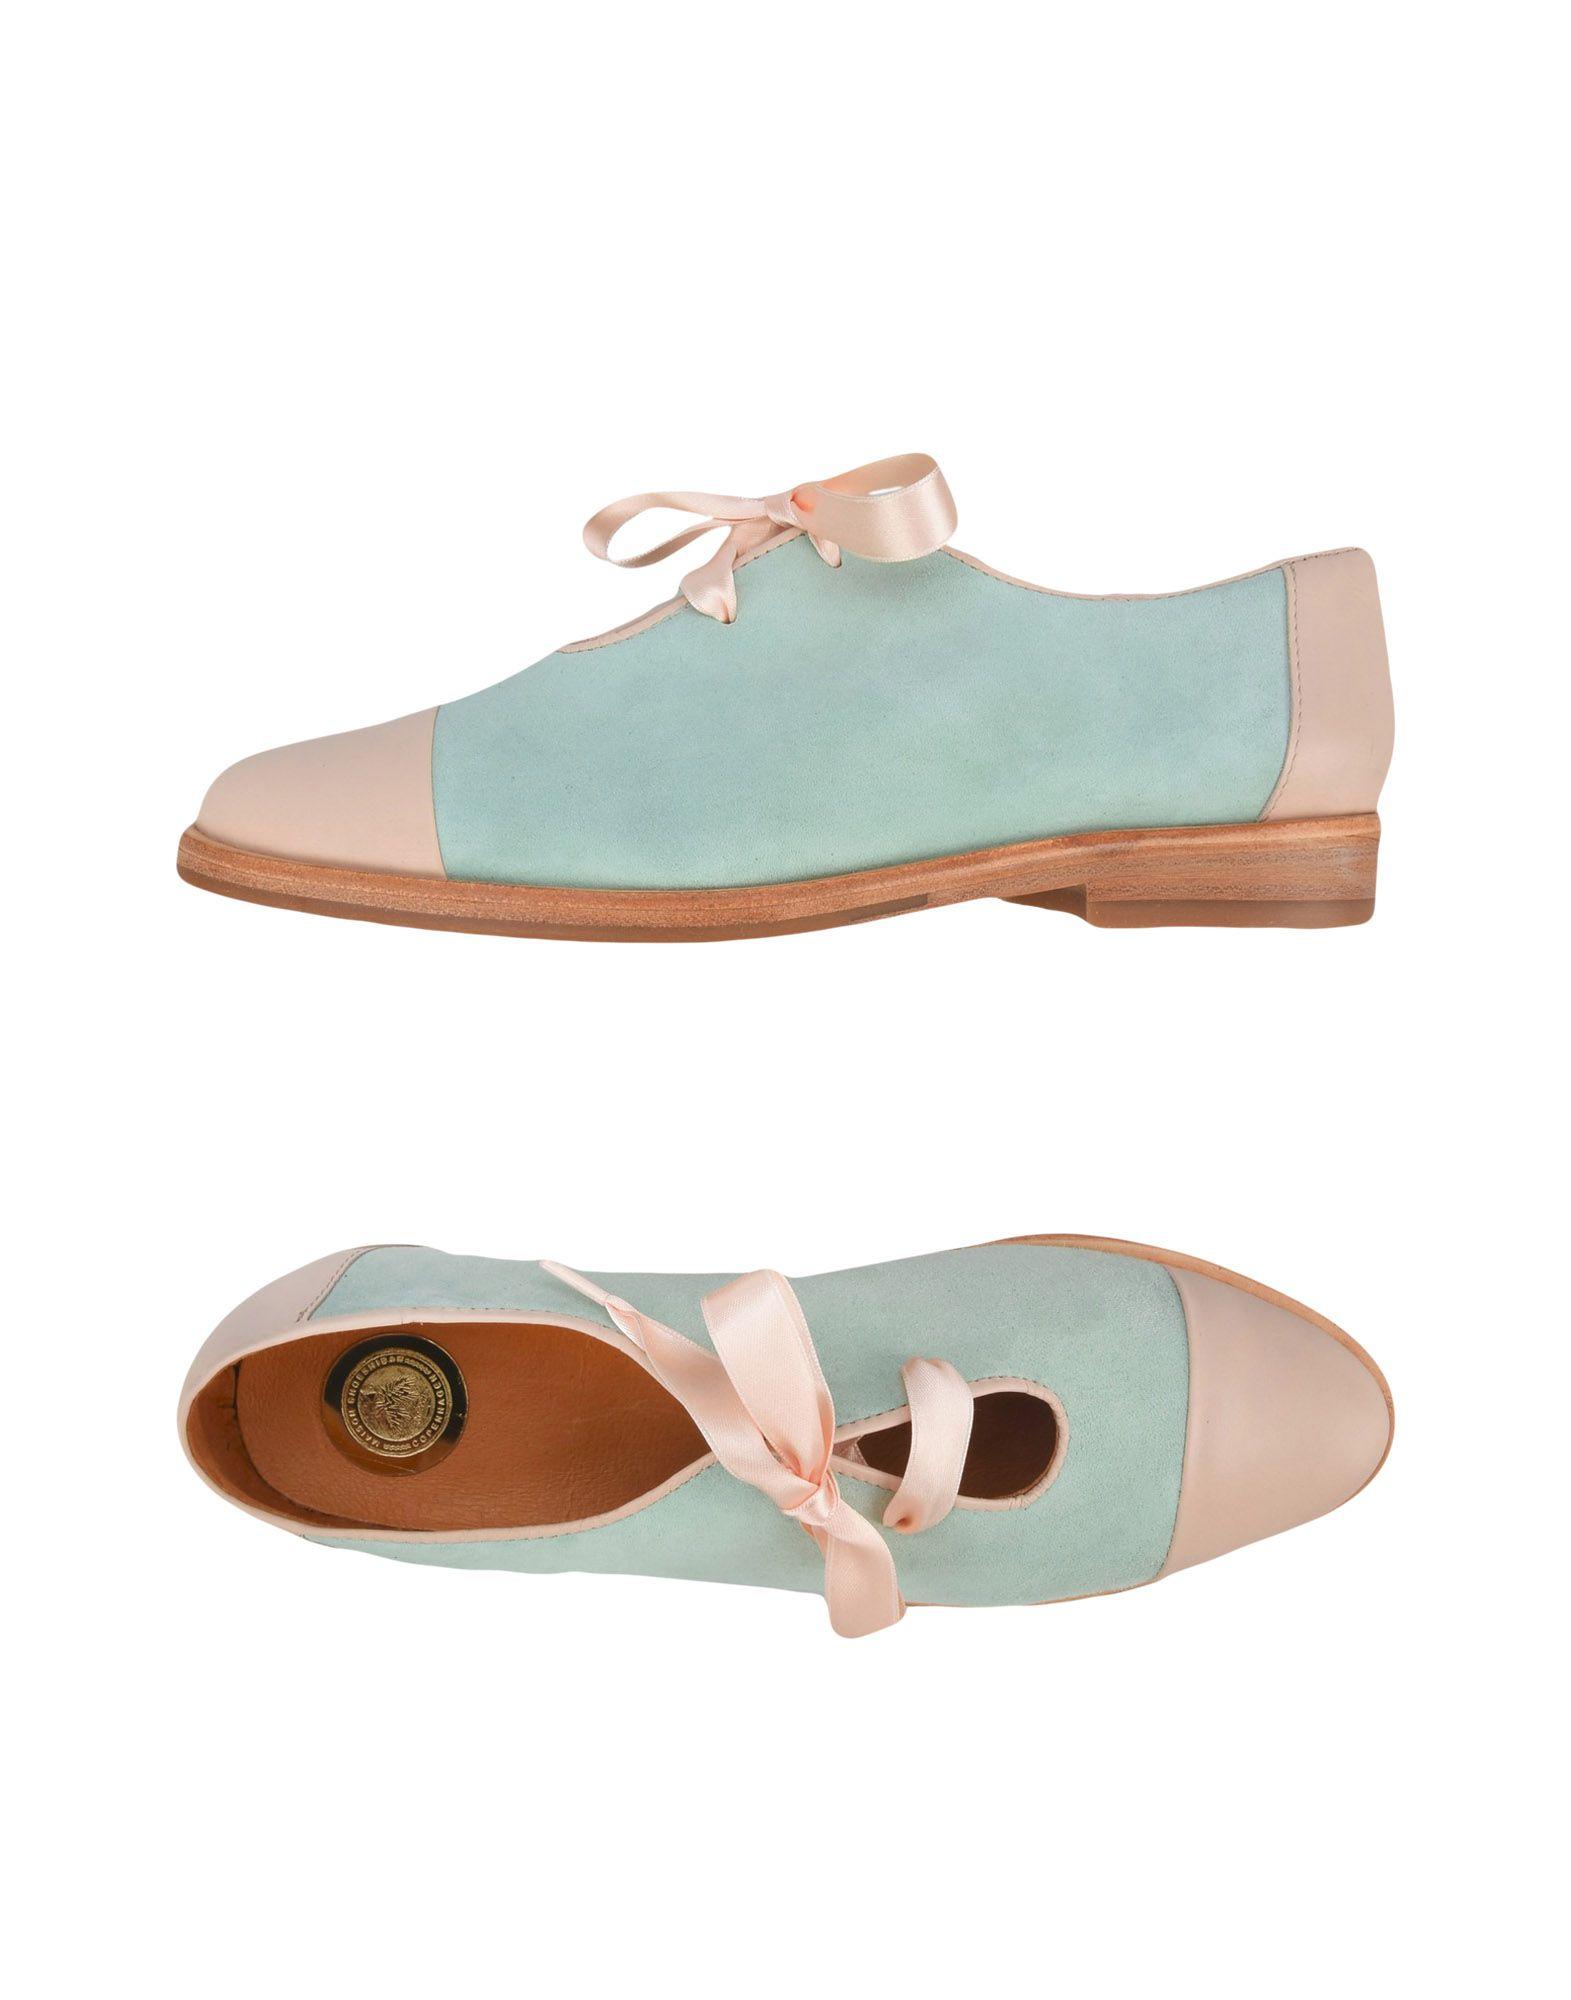 MAISON SHOESHIBAR Обувь на шнурках цены онлайн